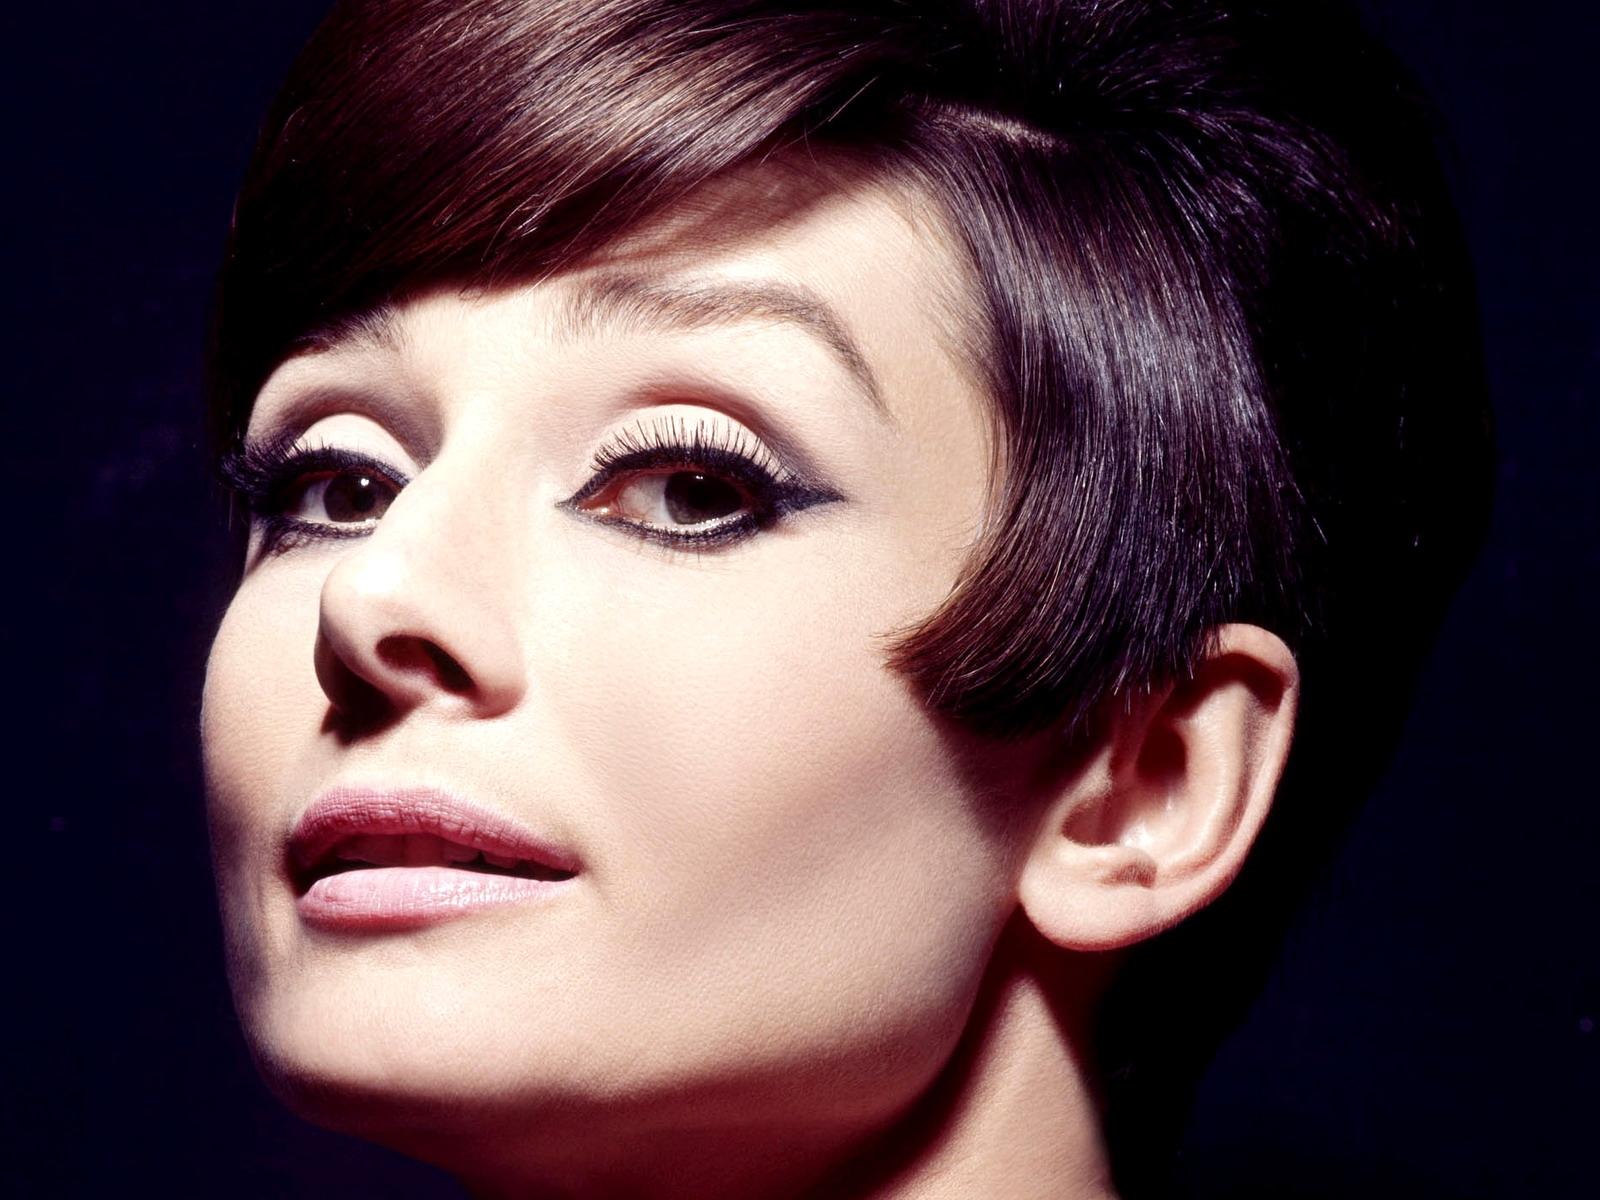 Wallpaper Face Long Hair Makeup Black Hair Bangs Nose Audrey